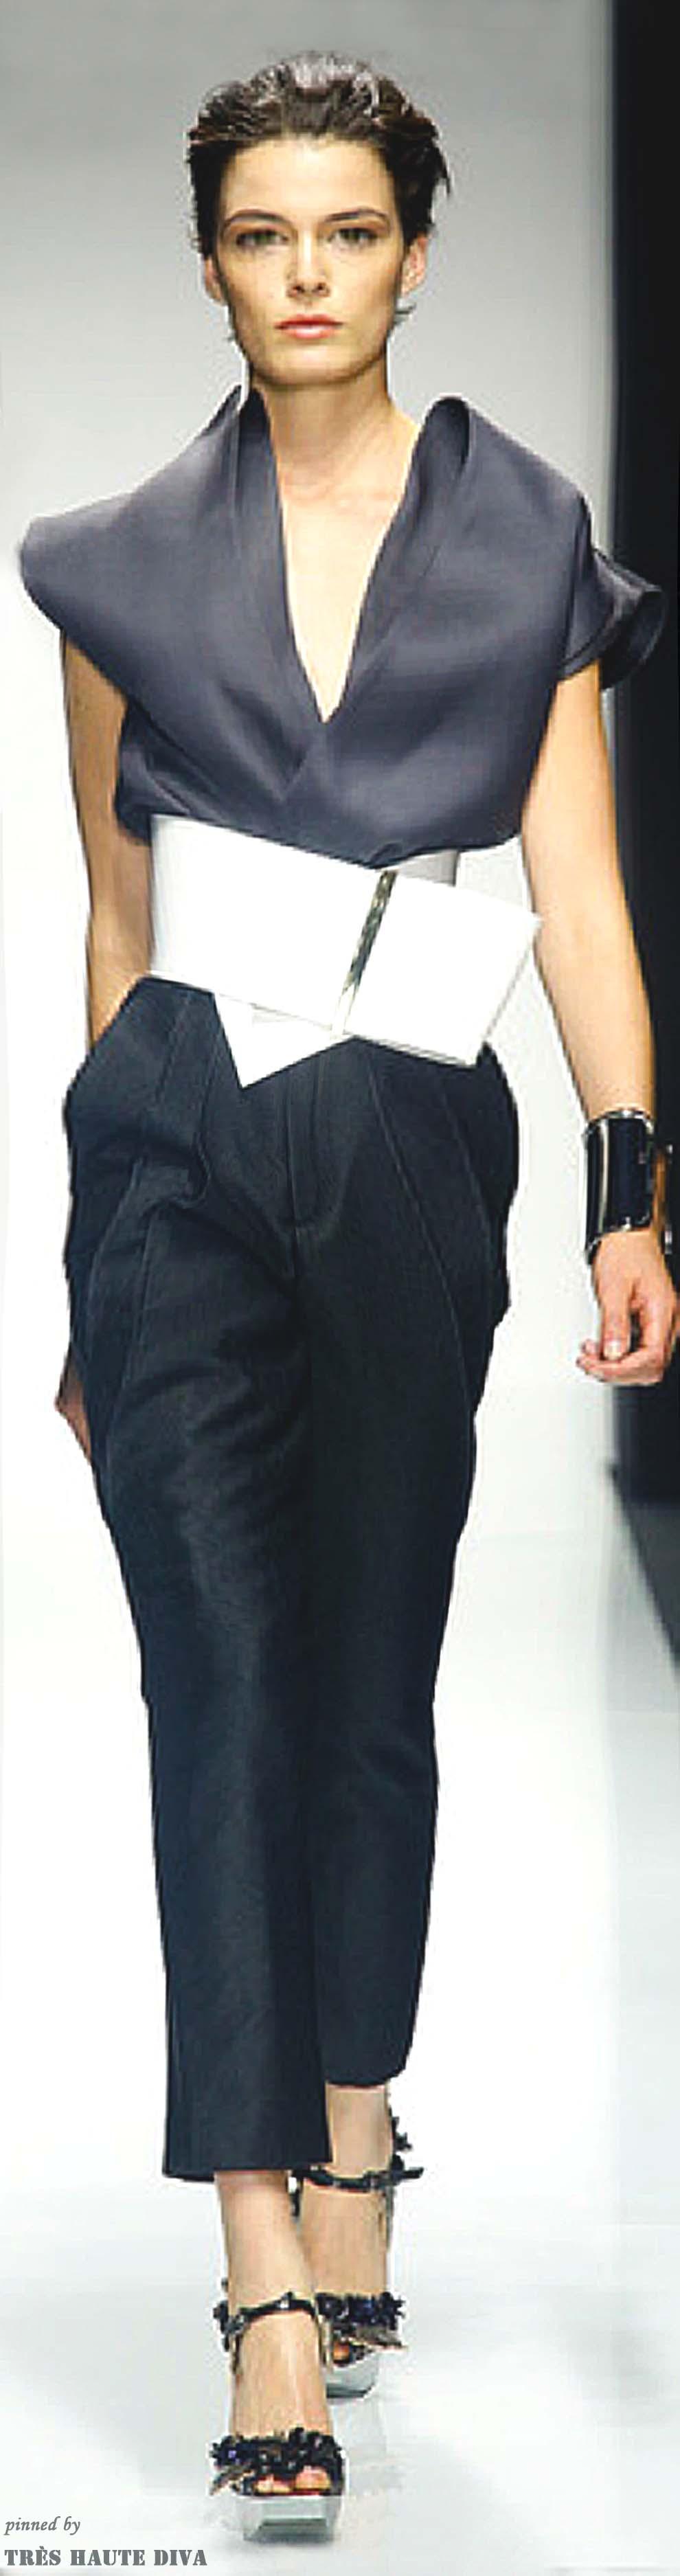 pin de krizia galvan en runway pinterest blusas finas